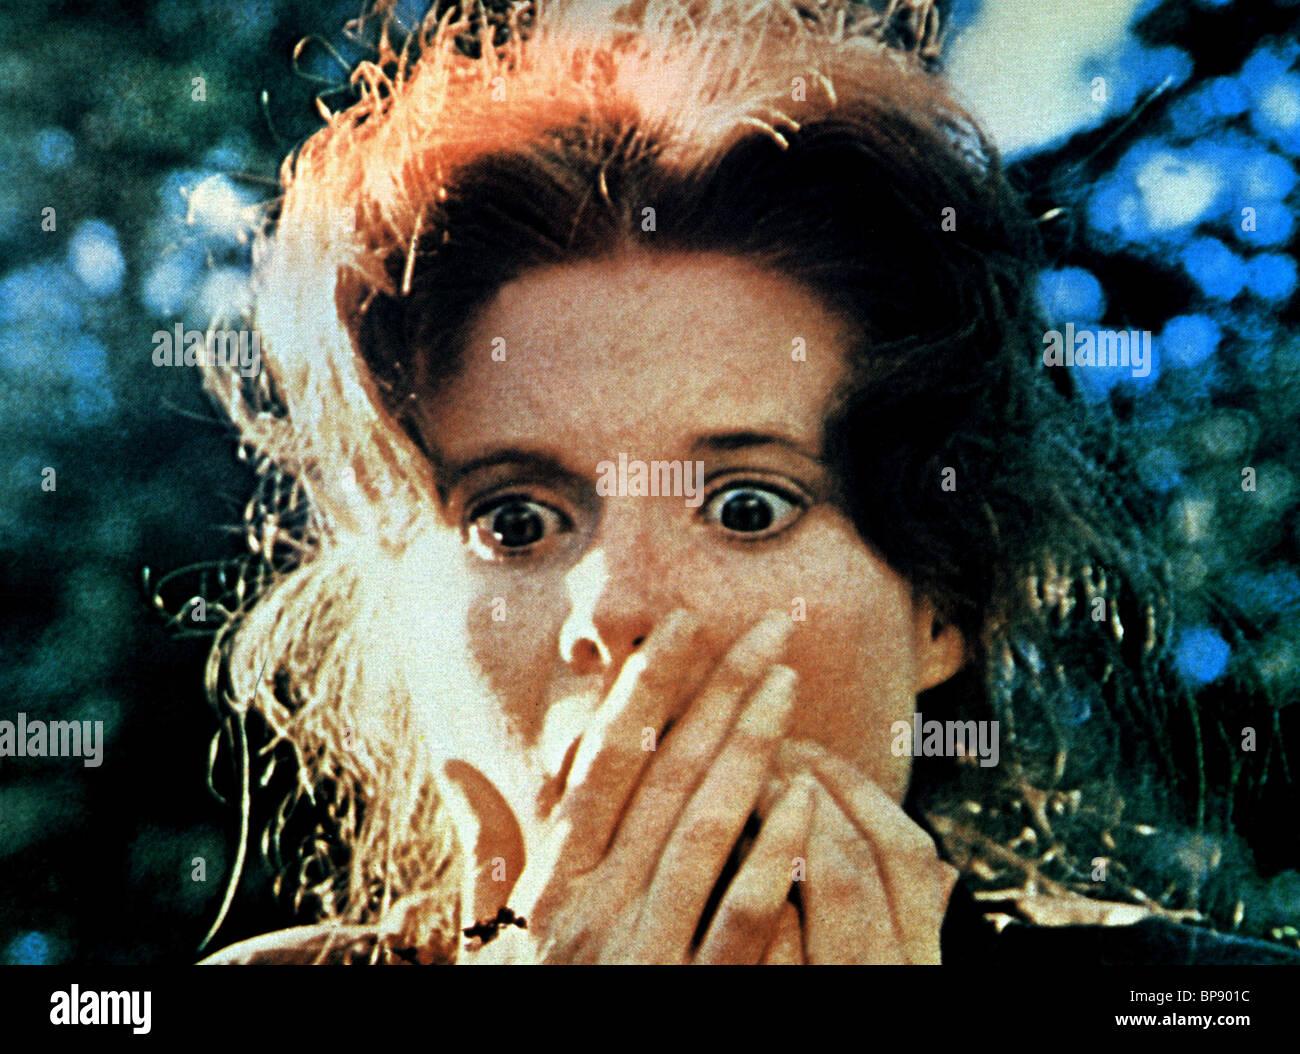 Minnie Driver (born 1970 (naturalized American citizen),Susan Hogan Erotic pictures Debbie Lee Australian rules football,Susan Ward